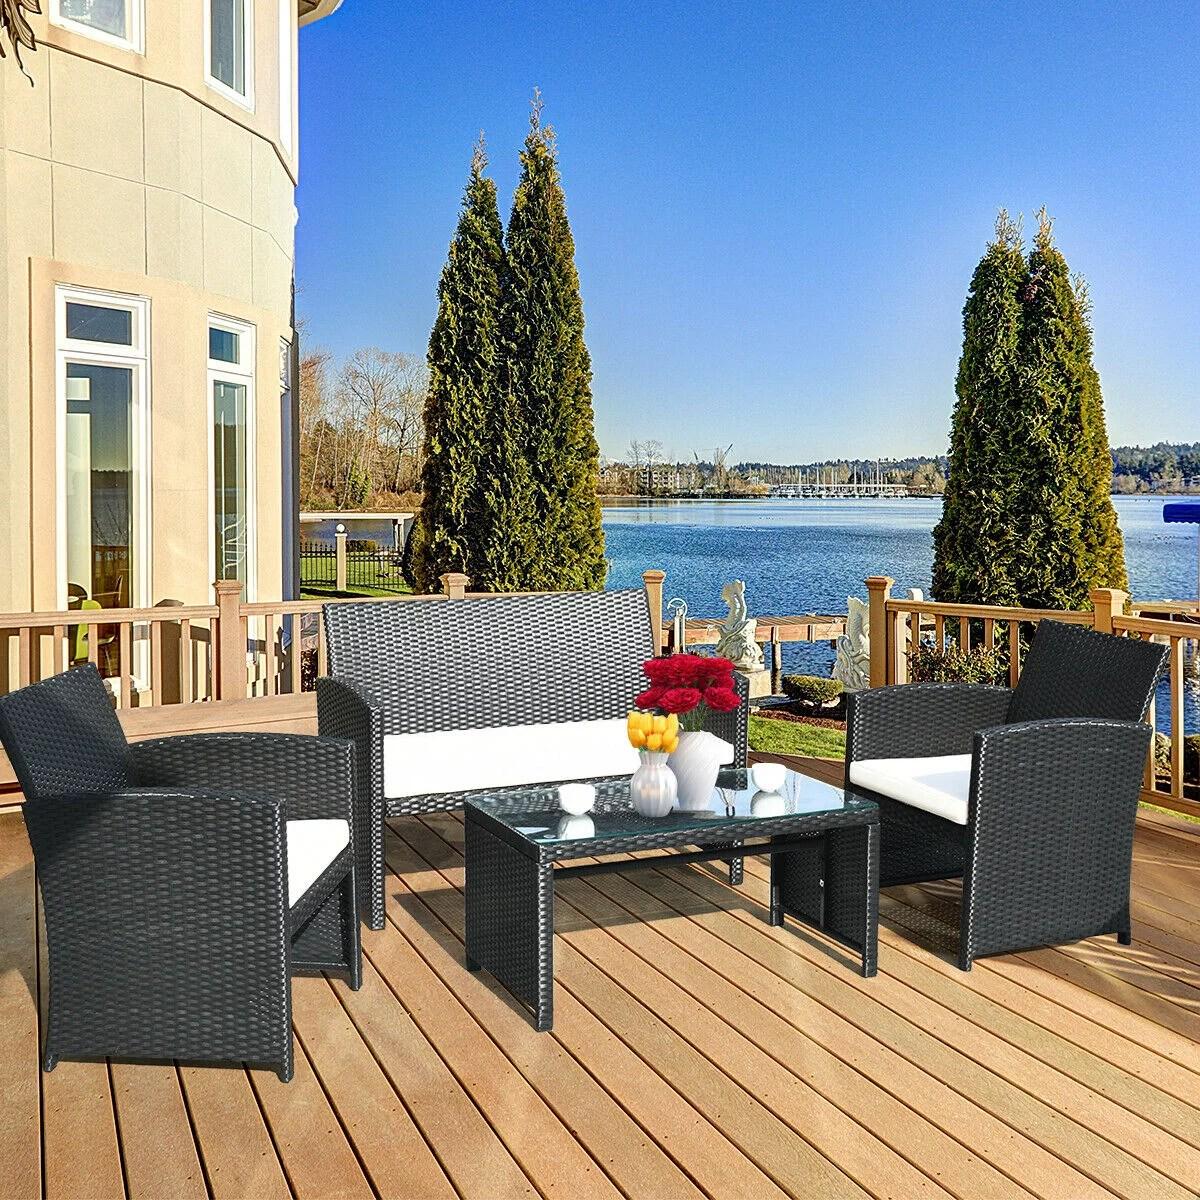 costway 4 pc rattan patio furniture set garden lawn sofa rattan wicker with white cushions walmart com